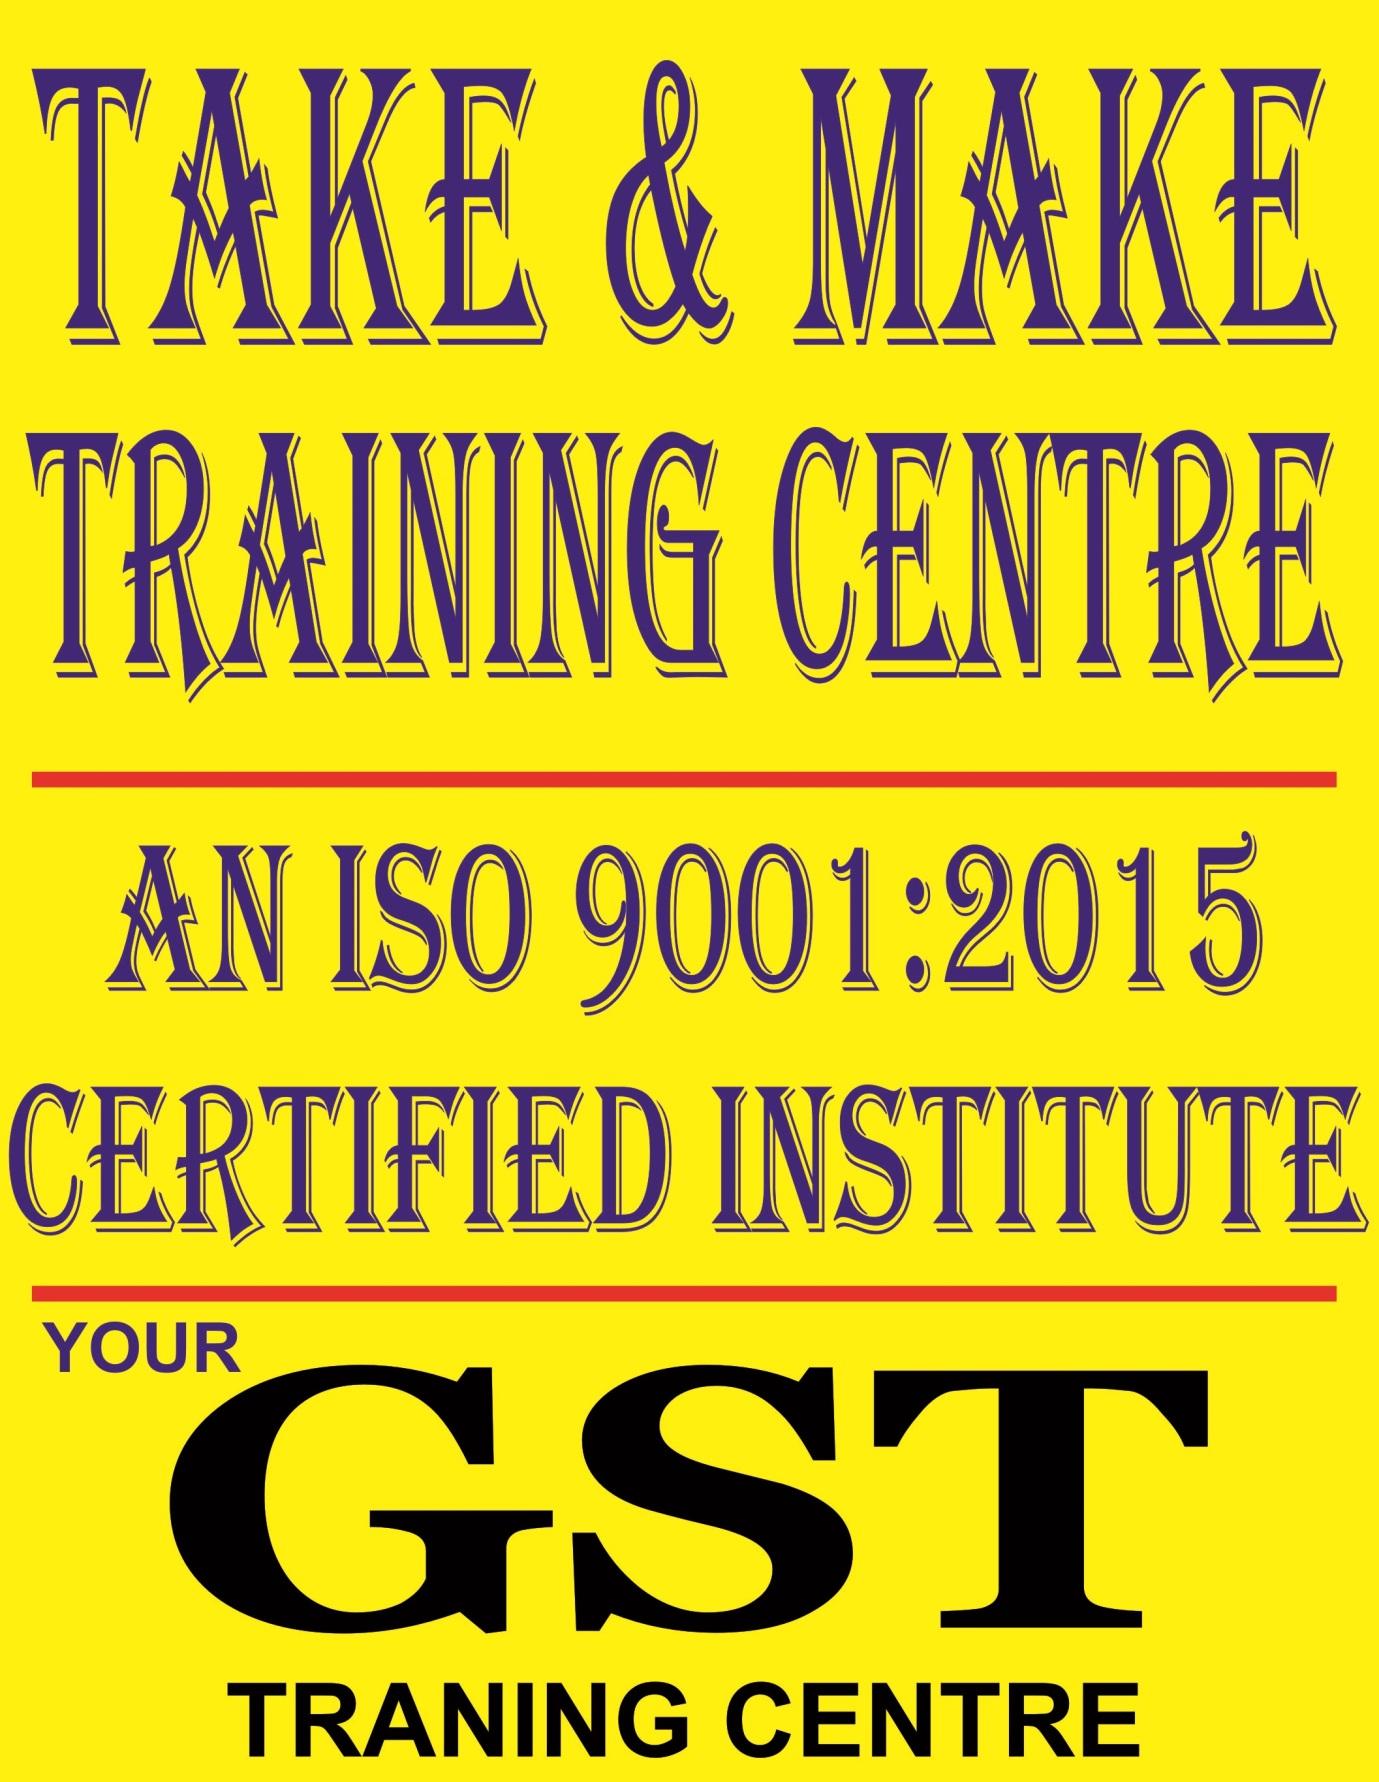 Job Training in Baguiati, Kolkata, Centers, Institutes